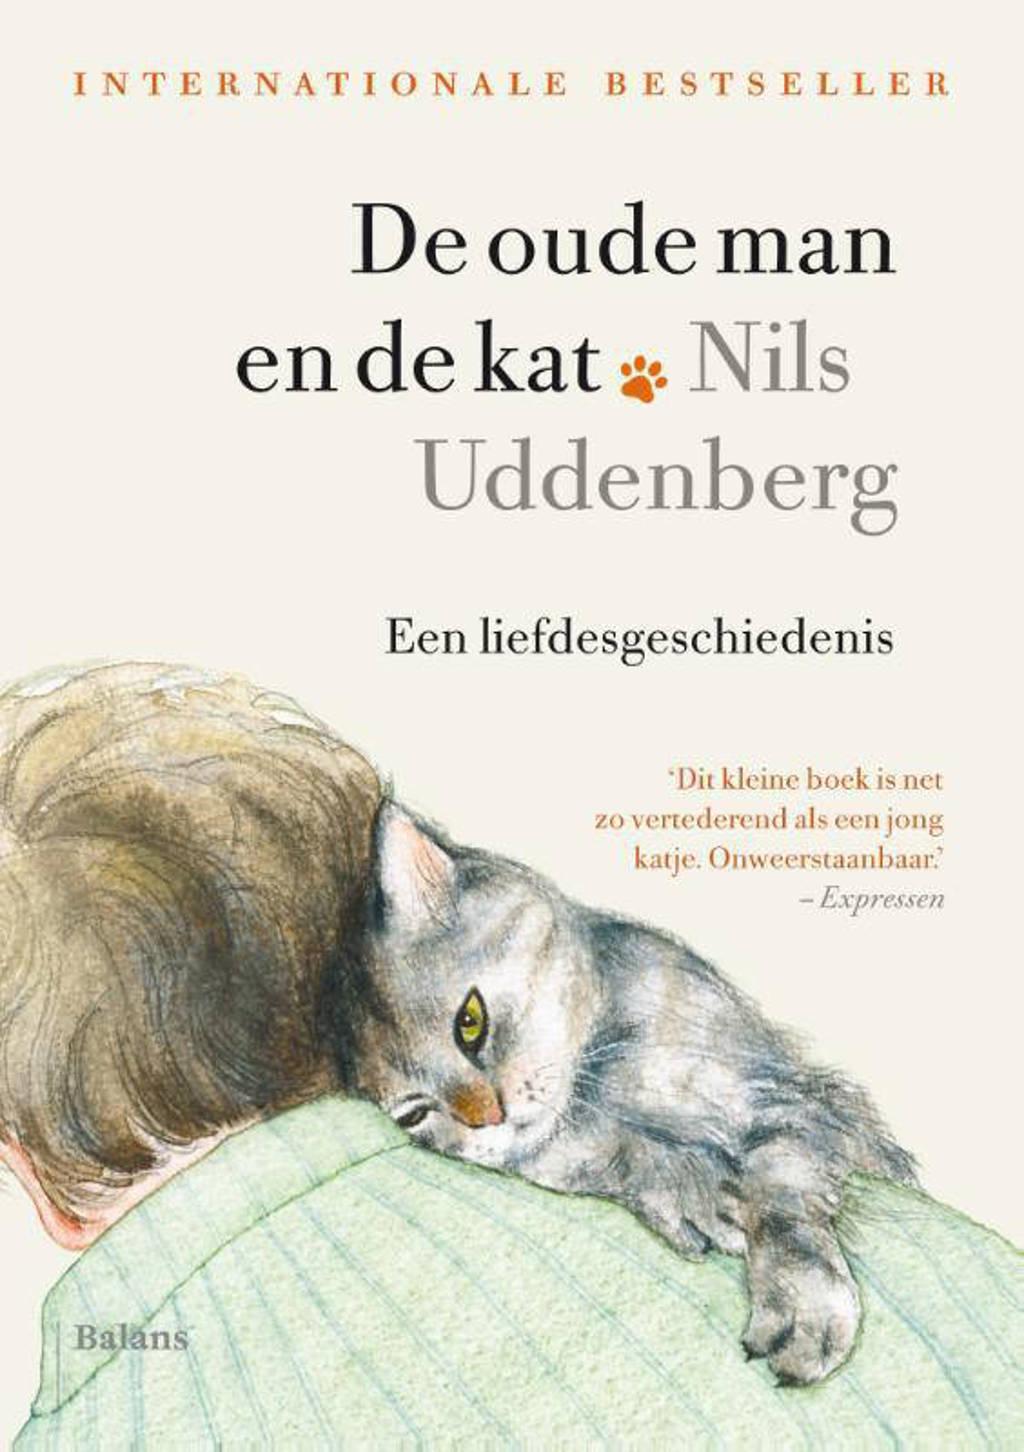 De oude man en de kat - Nils Uddenberg